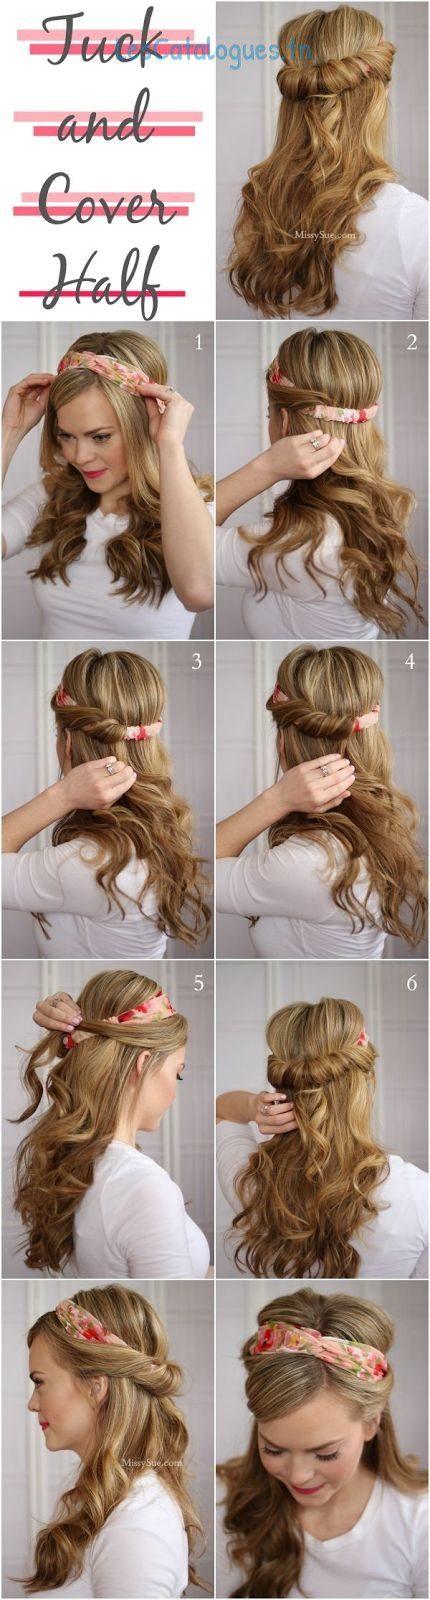 coiffure-cheveux-15